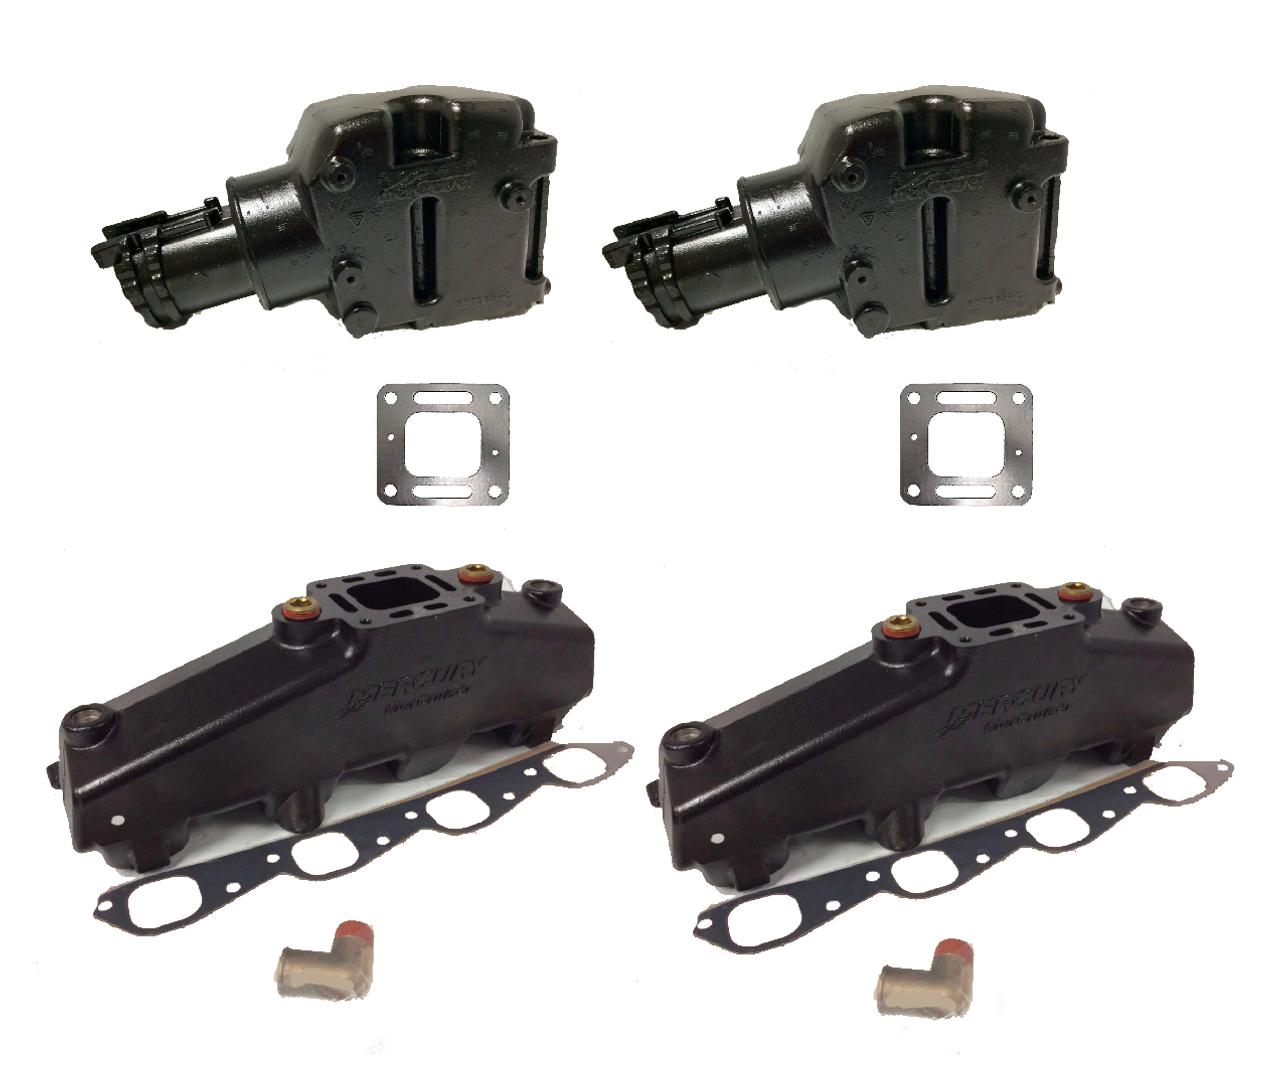 OEM MerCruiser 7 4 / 454 / 502 Exhaust Manifold and Riser kit 807078T08